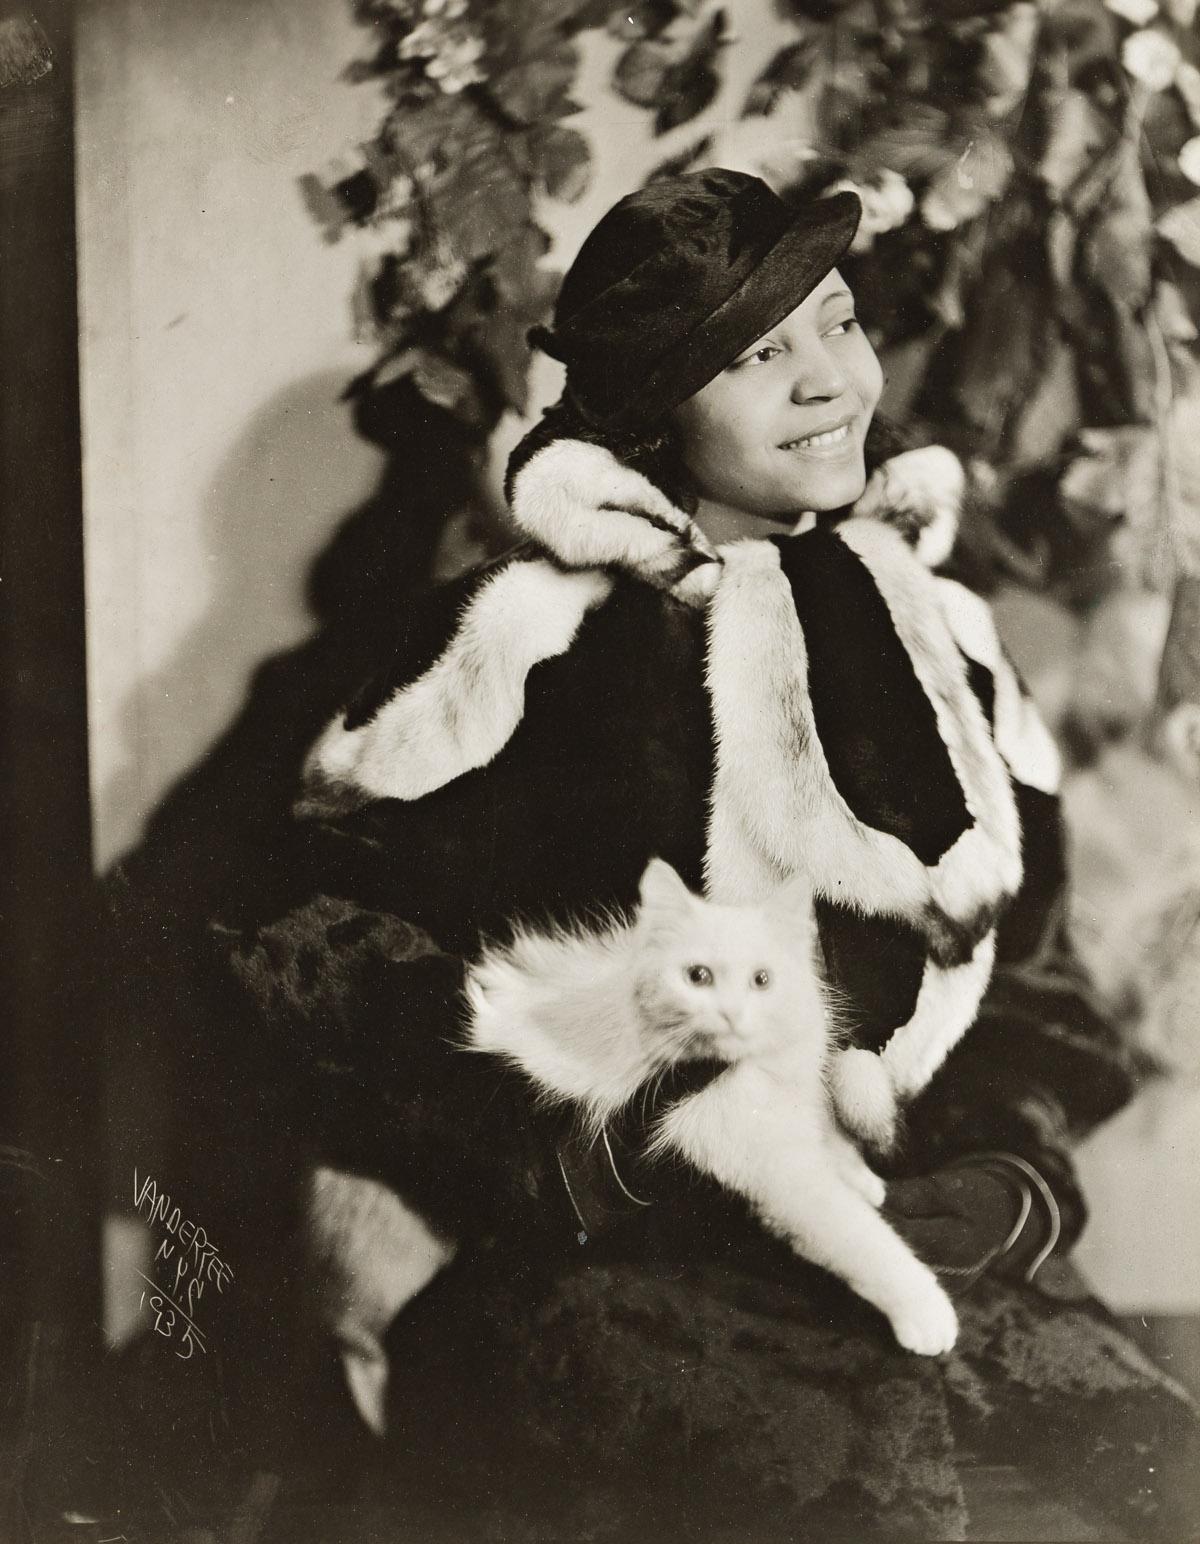 JAMES VANDERZEE (1886 - 1983) Untitled (Woman in Fur Holding Cat).